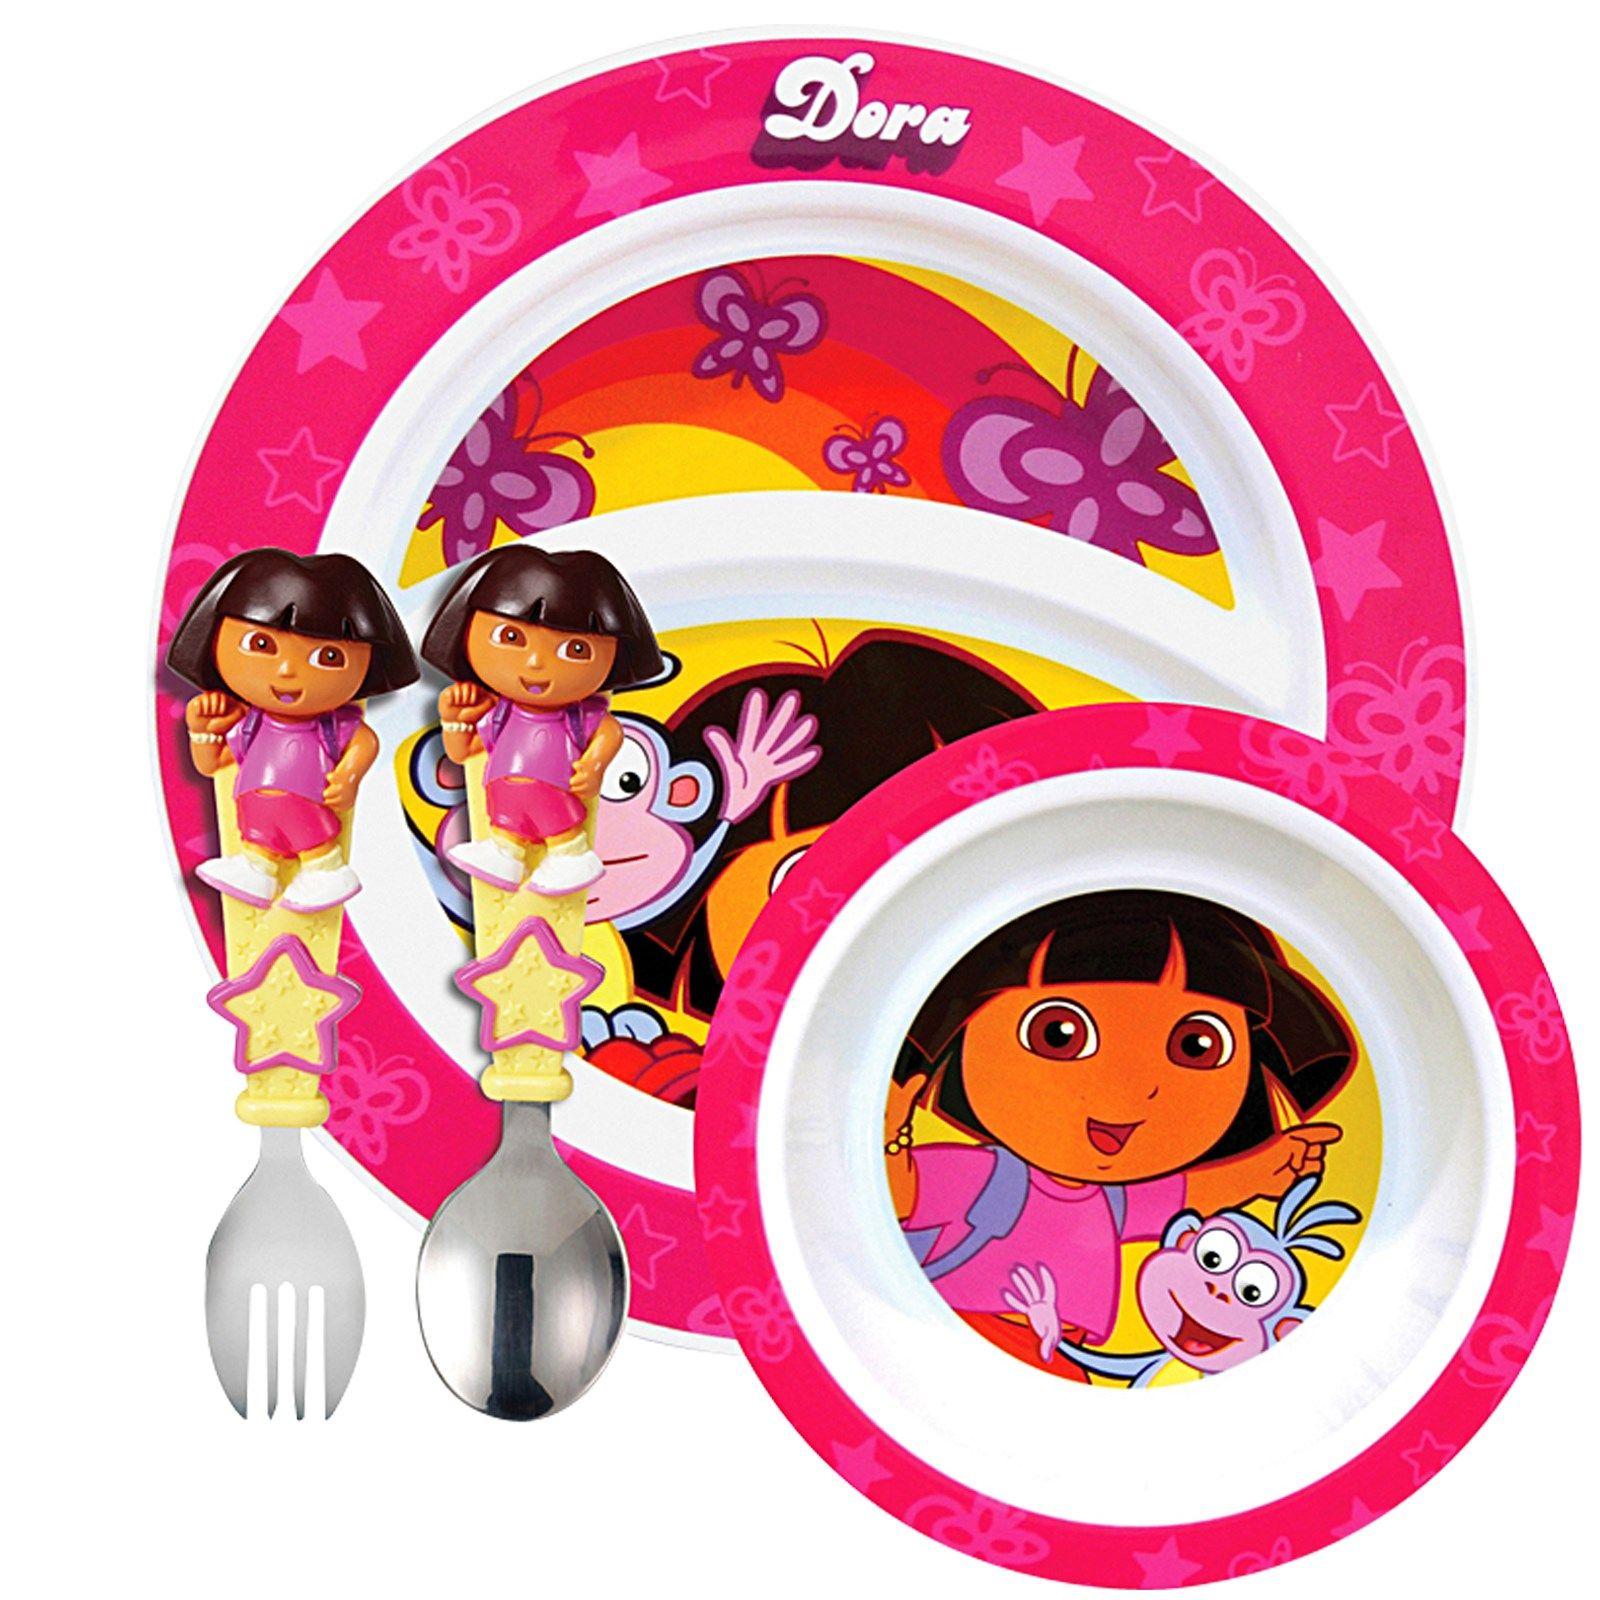 Munchkin Dora the Explorer Toddler Dining Set (Discontinued Item)  sc 1 st  Pinterest & Munchkin Dora the Explorer Toddler Dining Set (Discontinued Item ...